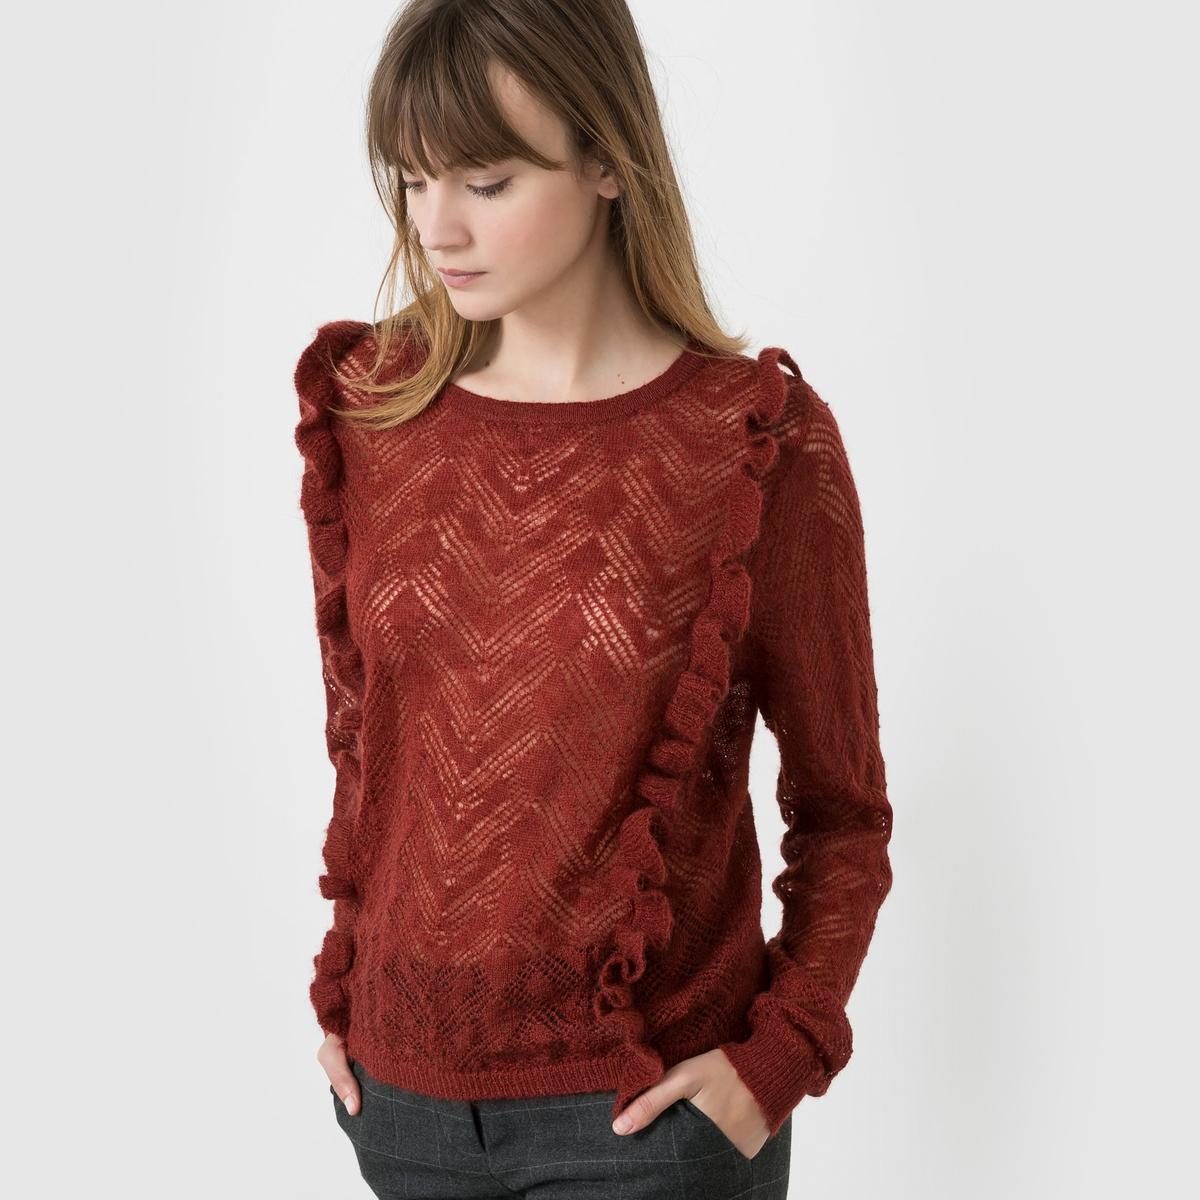 Пуловер из ажурного трикотажа с воланами